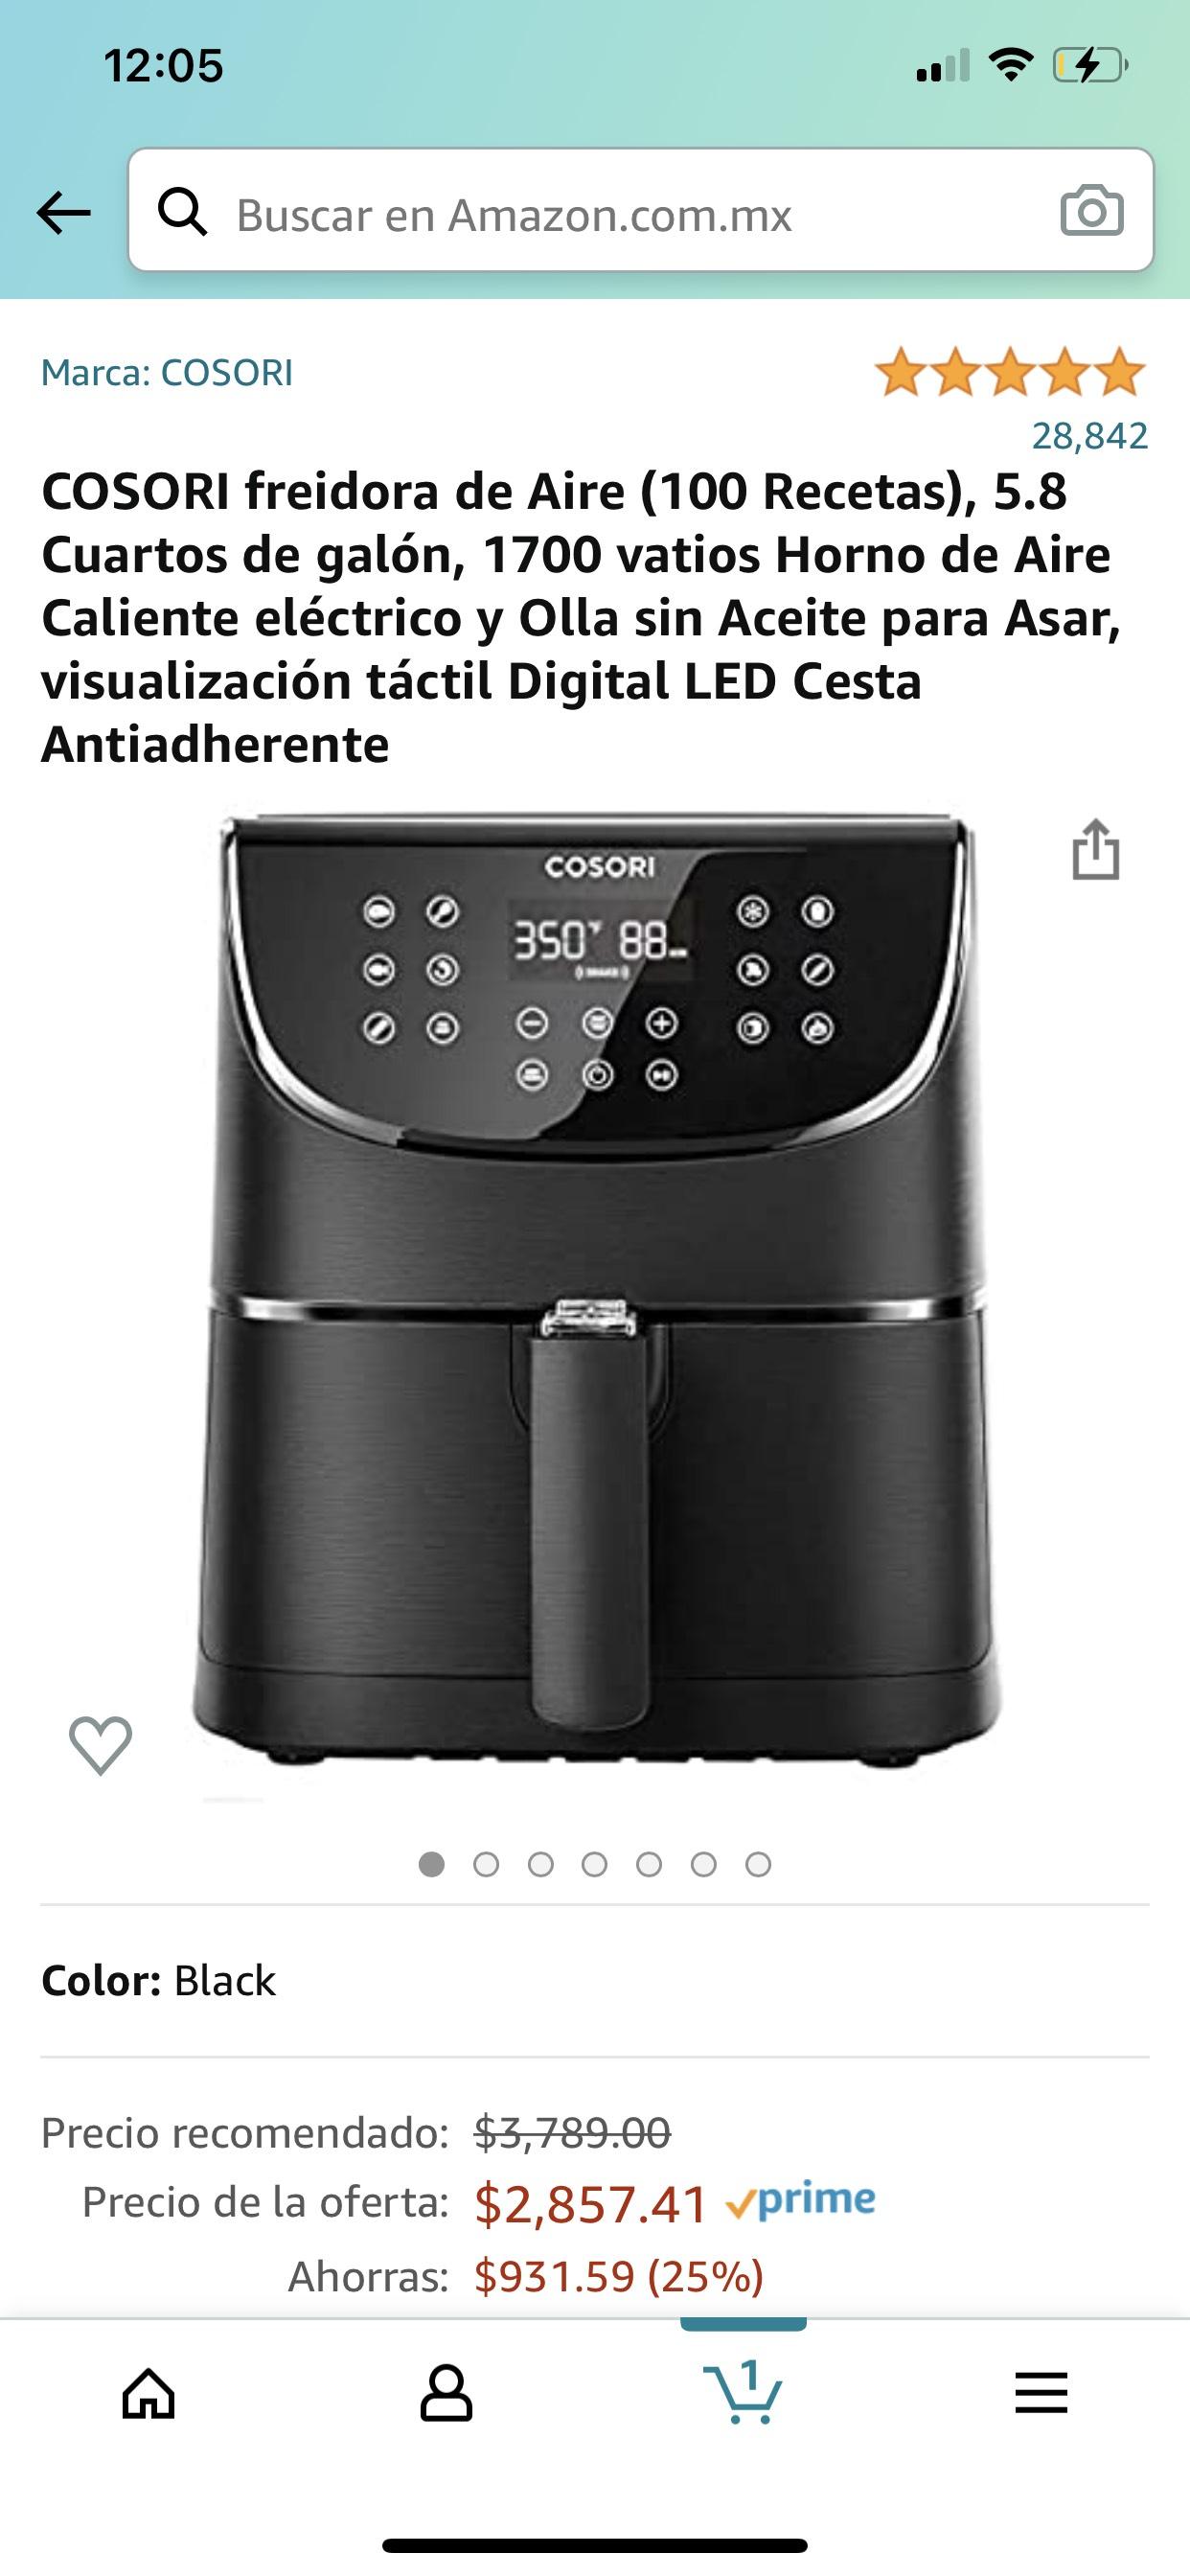 Amazon: COSORI freidora de Aire (100 Recetas), 5.8 Cuartos de galón, 1700 vatios